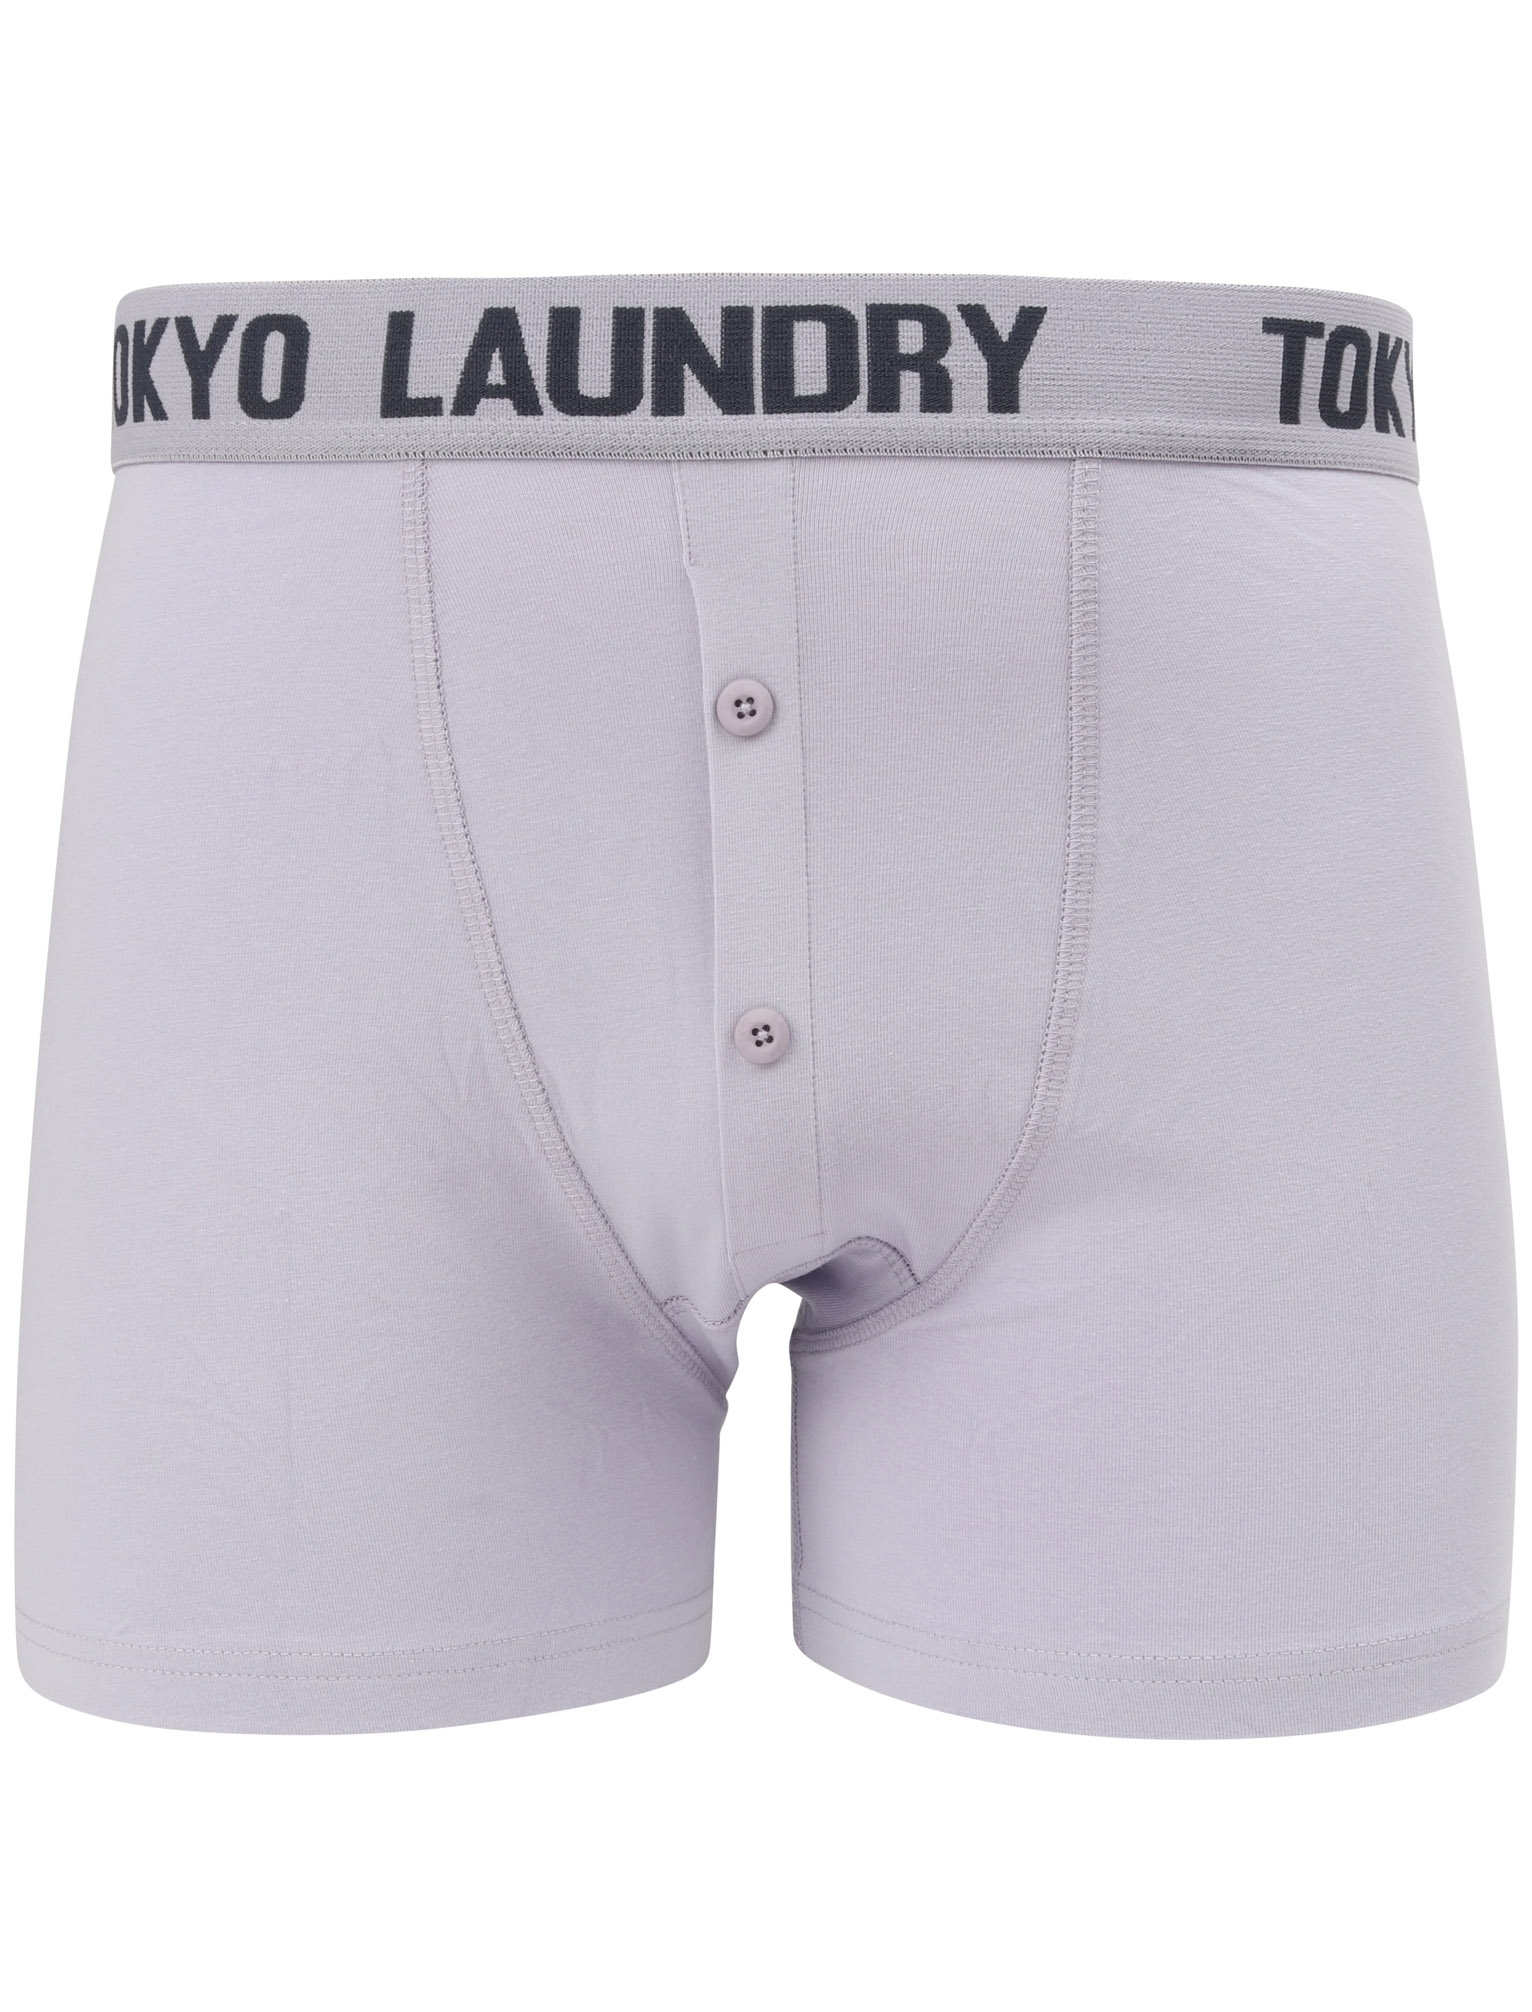 New-Mens-Tokyo-Laundry-Nash-2-Pack-Buttoned-Cotton-Boxer-Shorts-Set-Size-S-XXL thumbnail 15